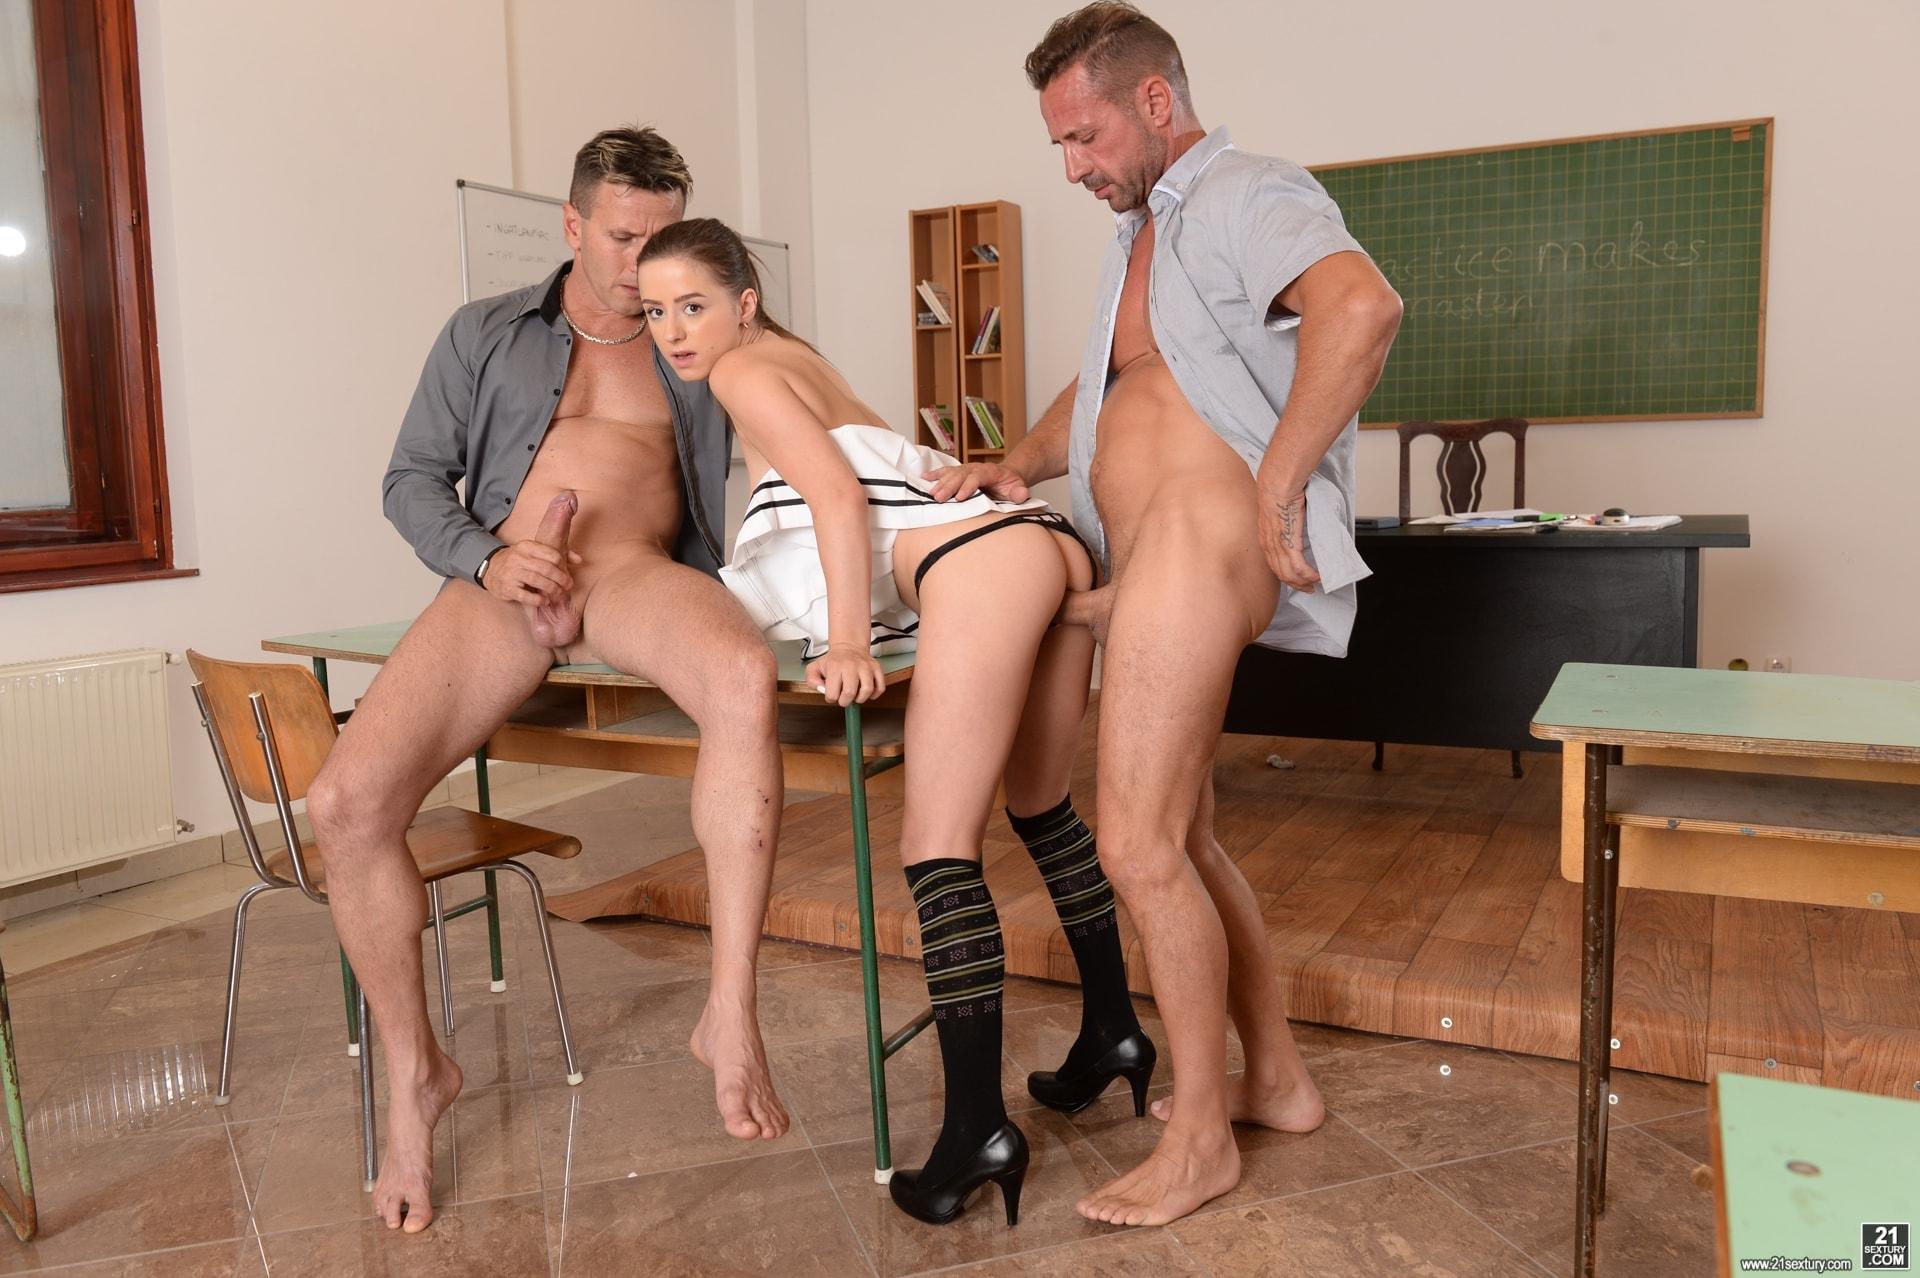 21Sextury 'Sex Ed Threesome' starring Gabriella Lati (Photo 56)